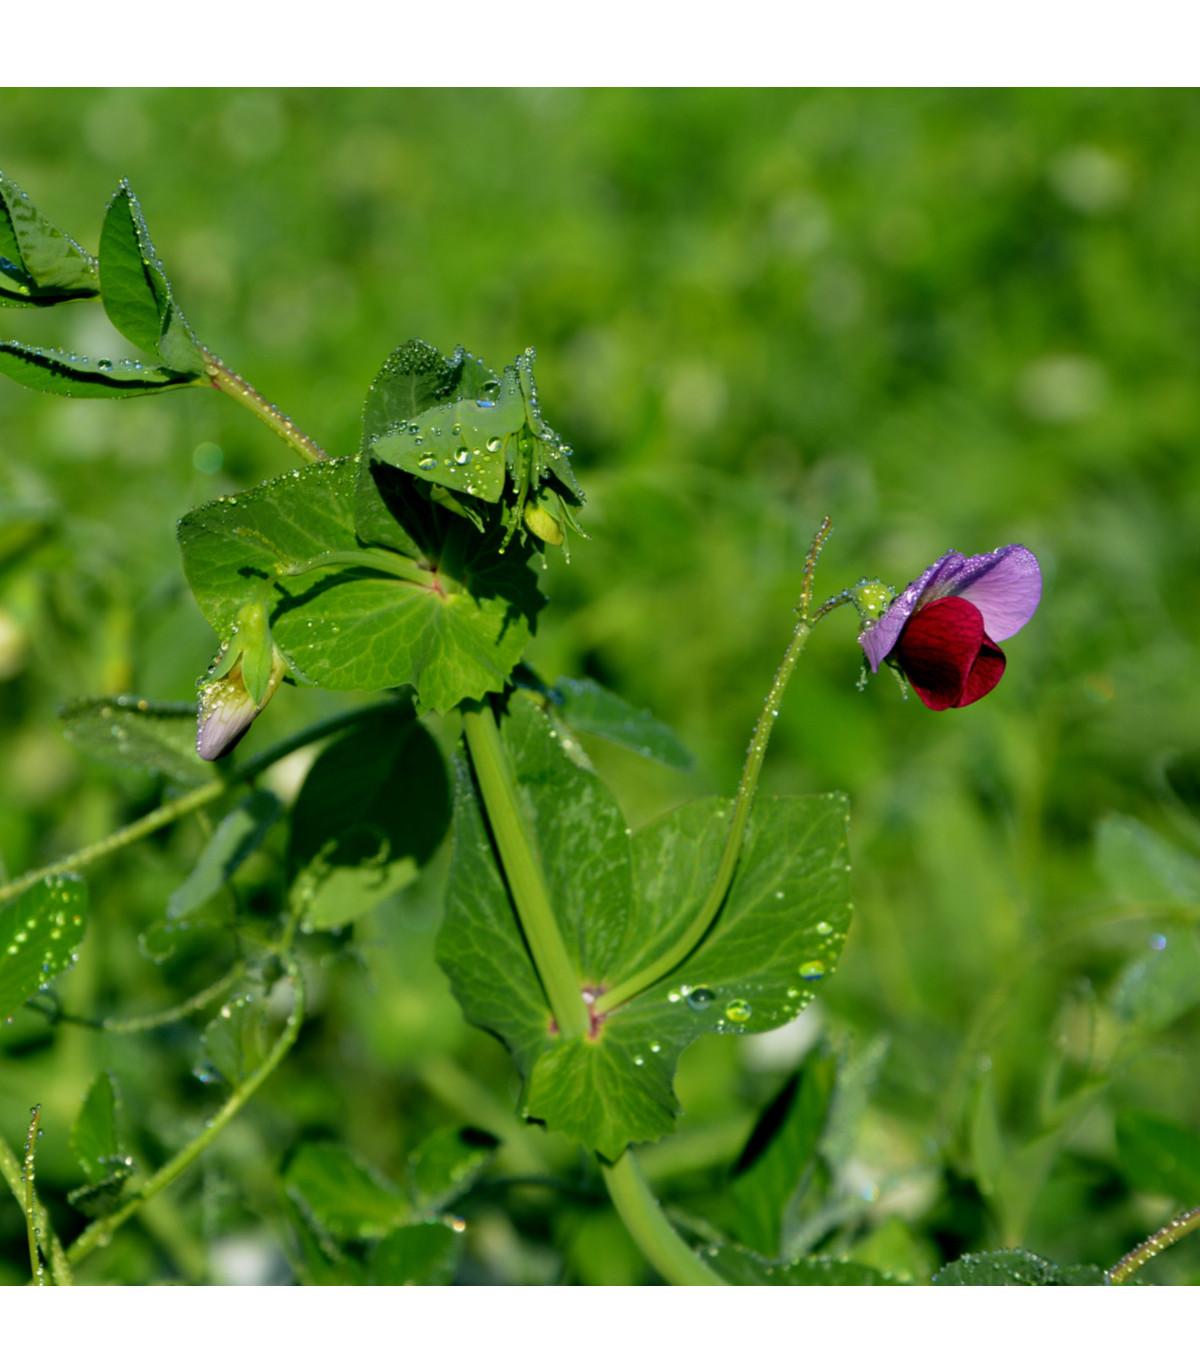 Hrách cukrový pestrobarevný - Pisum sativum - semena hrášku - 8 gr